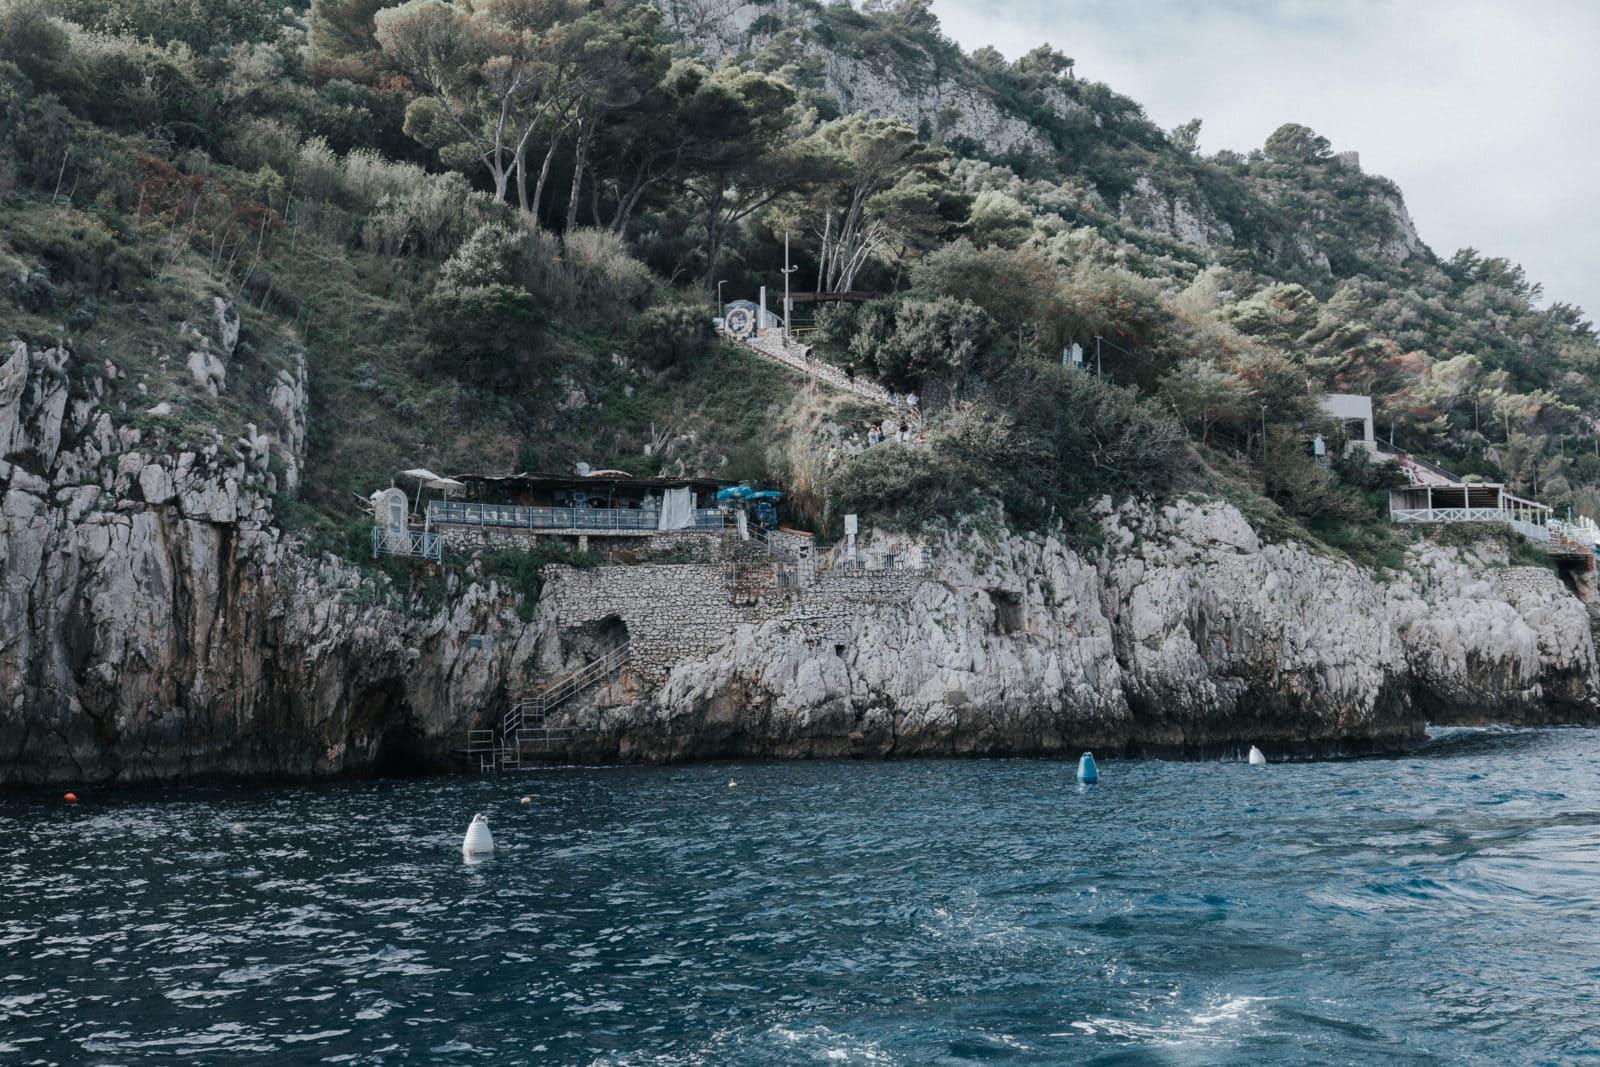 Blaue Grotte Capri Sehenswürdigkeiten Eingang